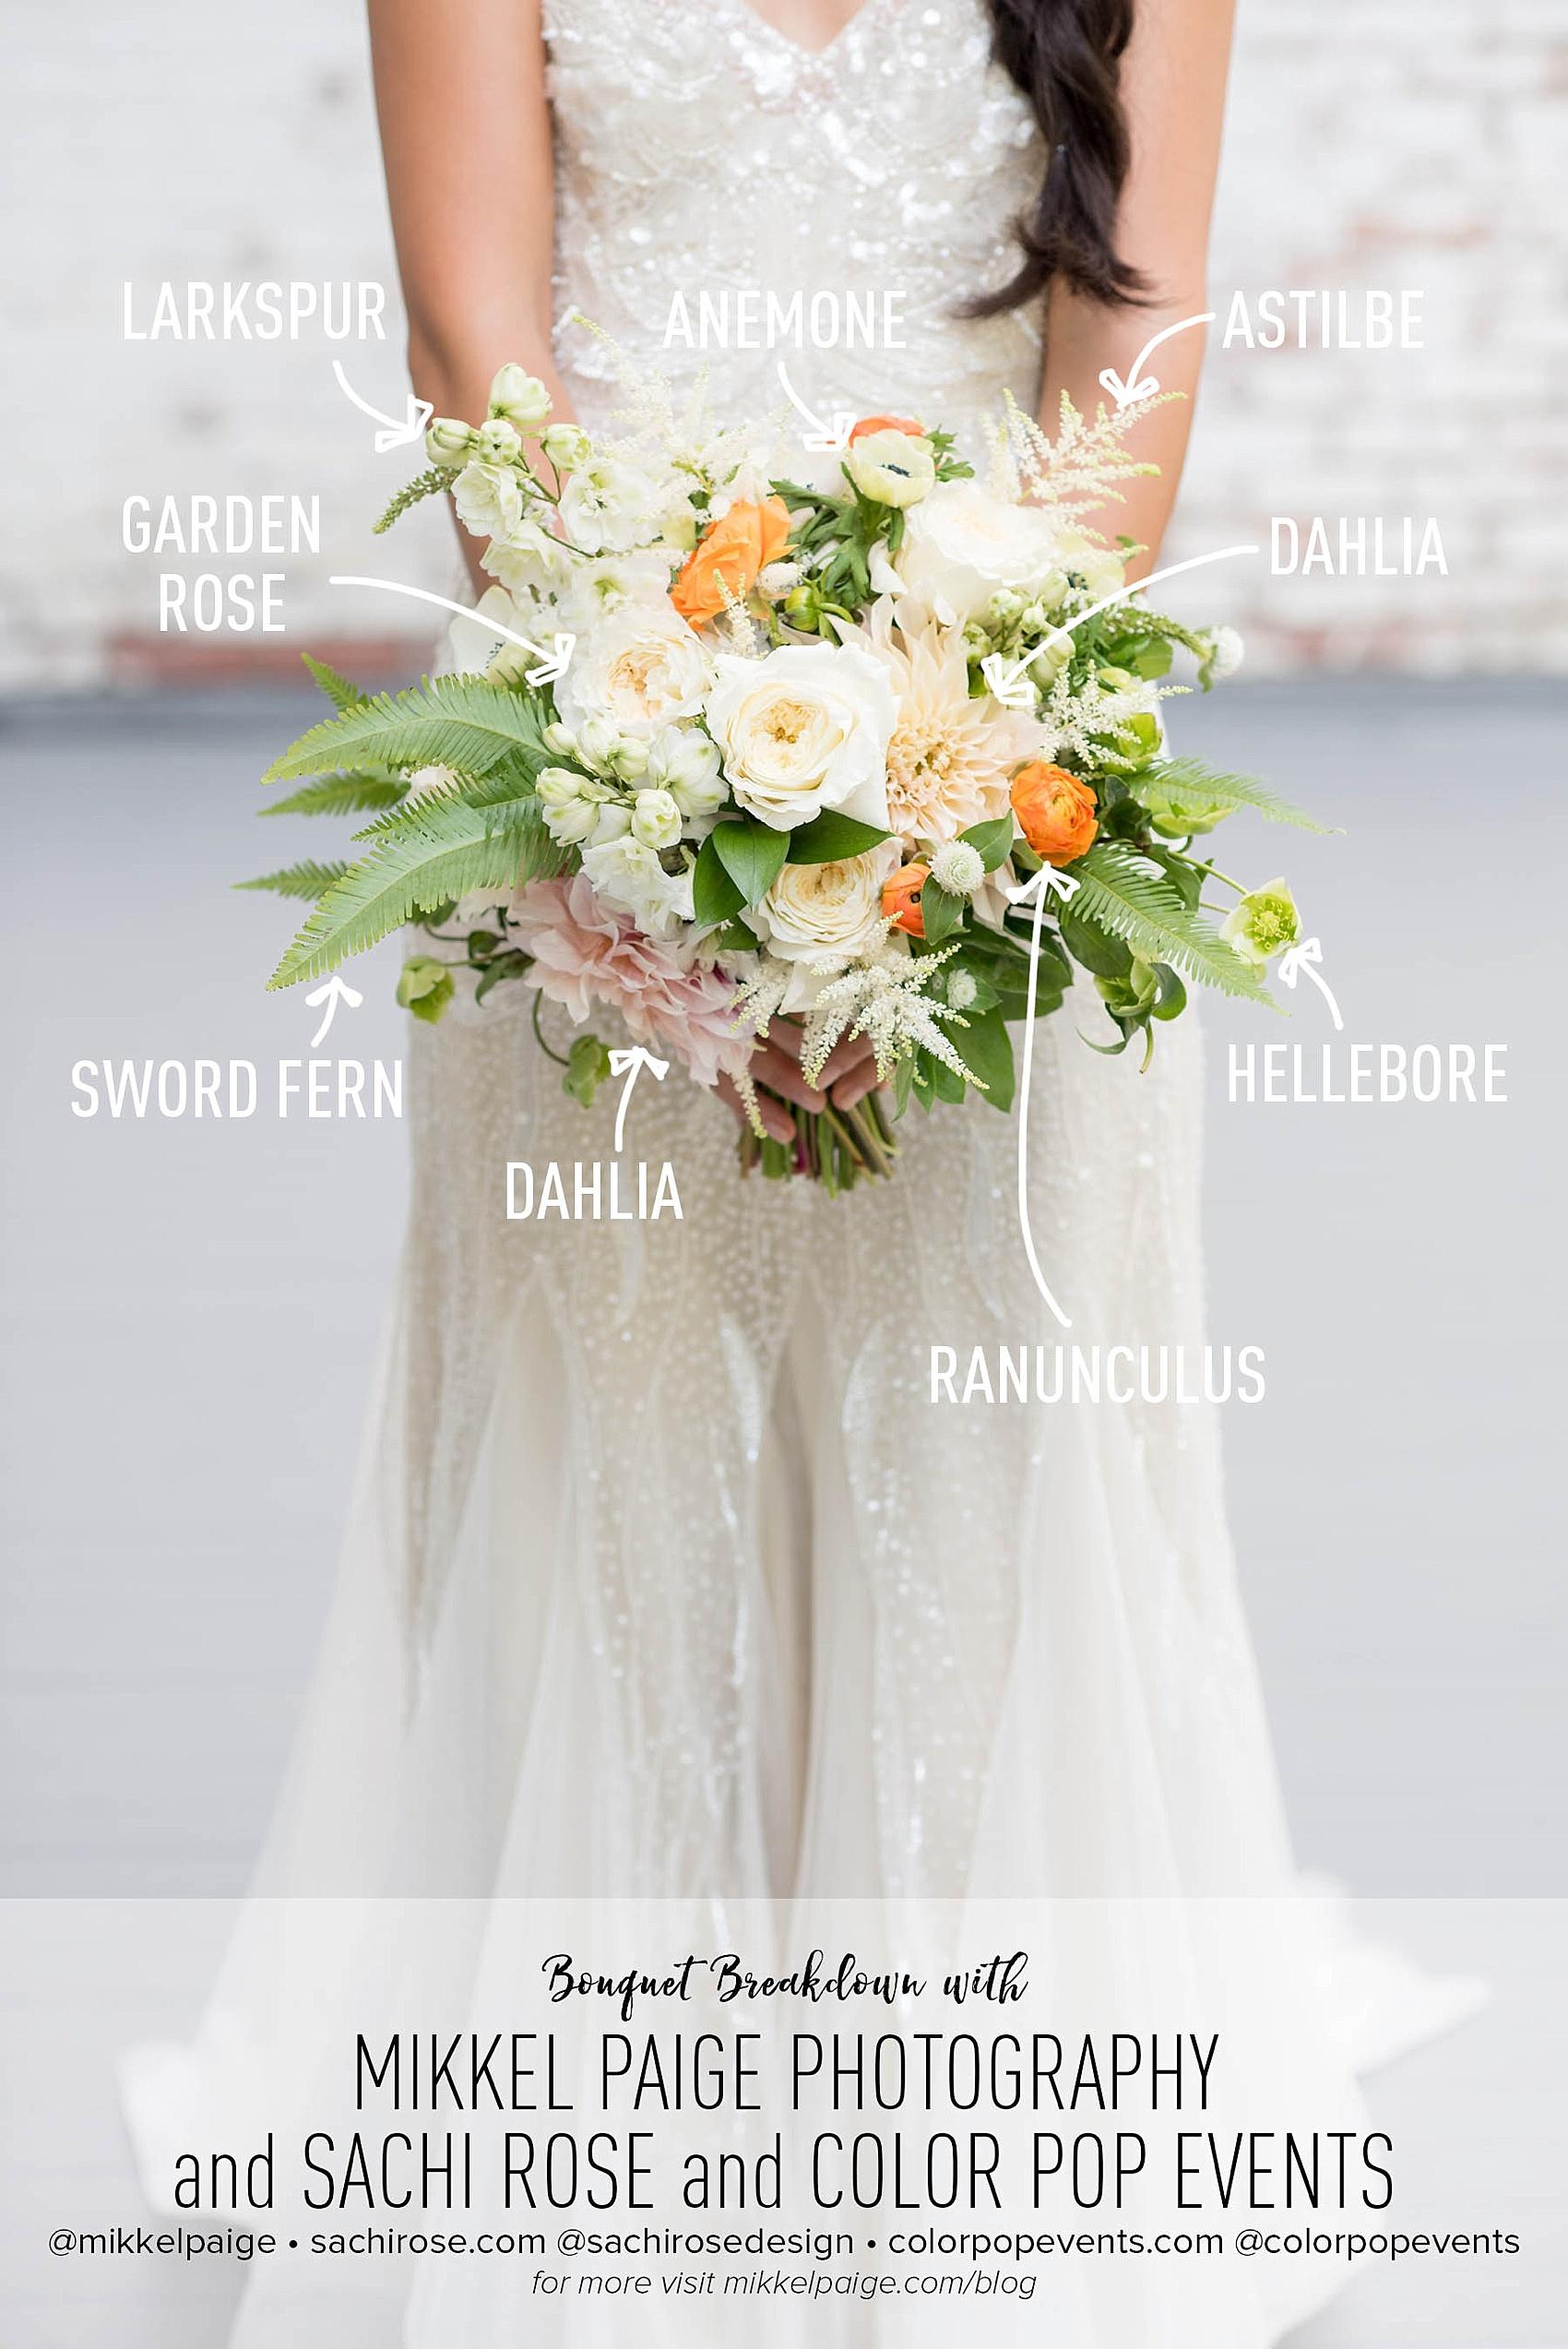 Bouquet Breakdown White And Orange Ranunculus Dahlia And Fern